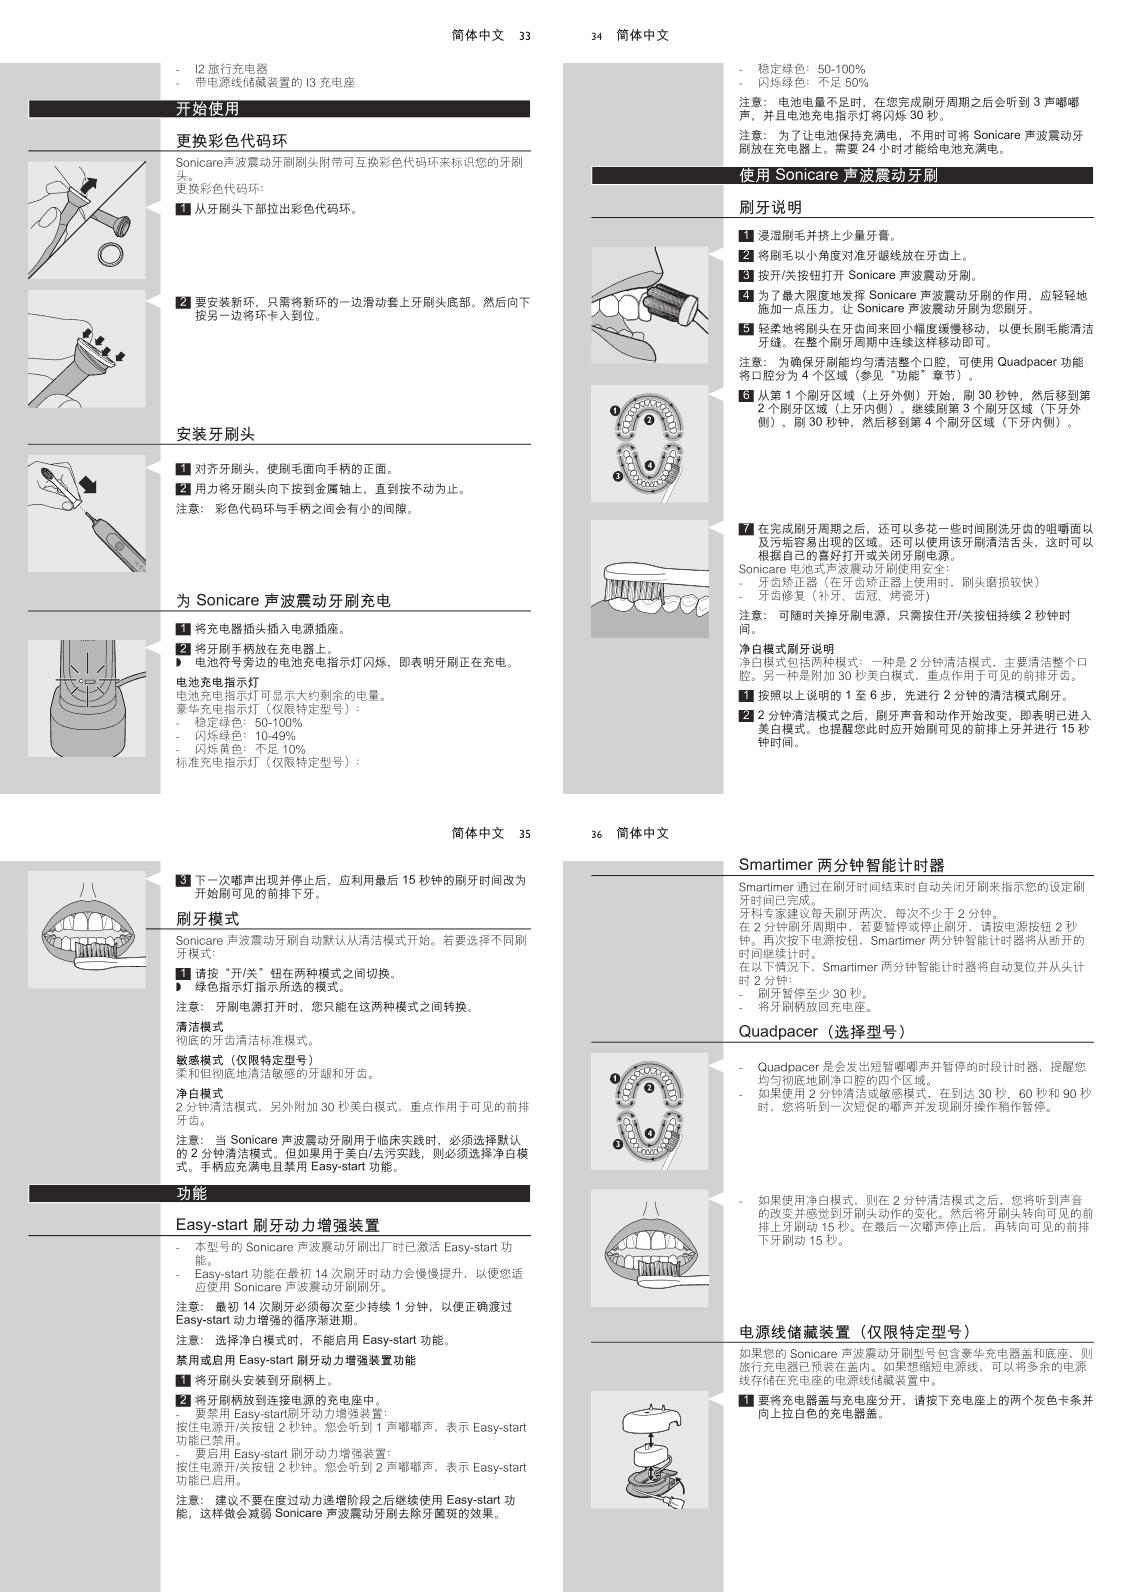 Philips Sonicare HealthyWhite HX6732用户手册